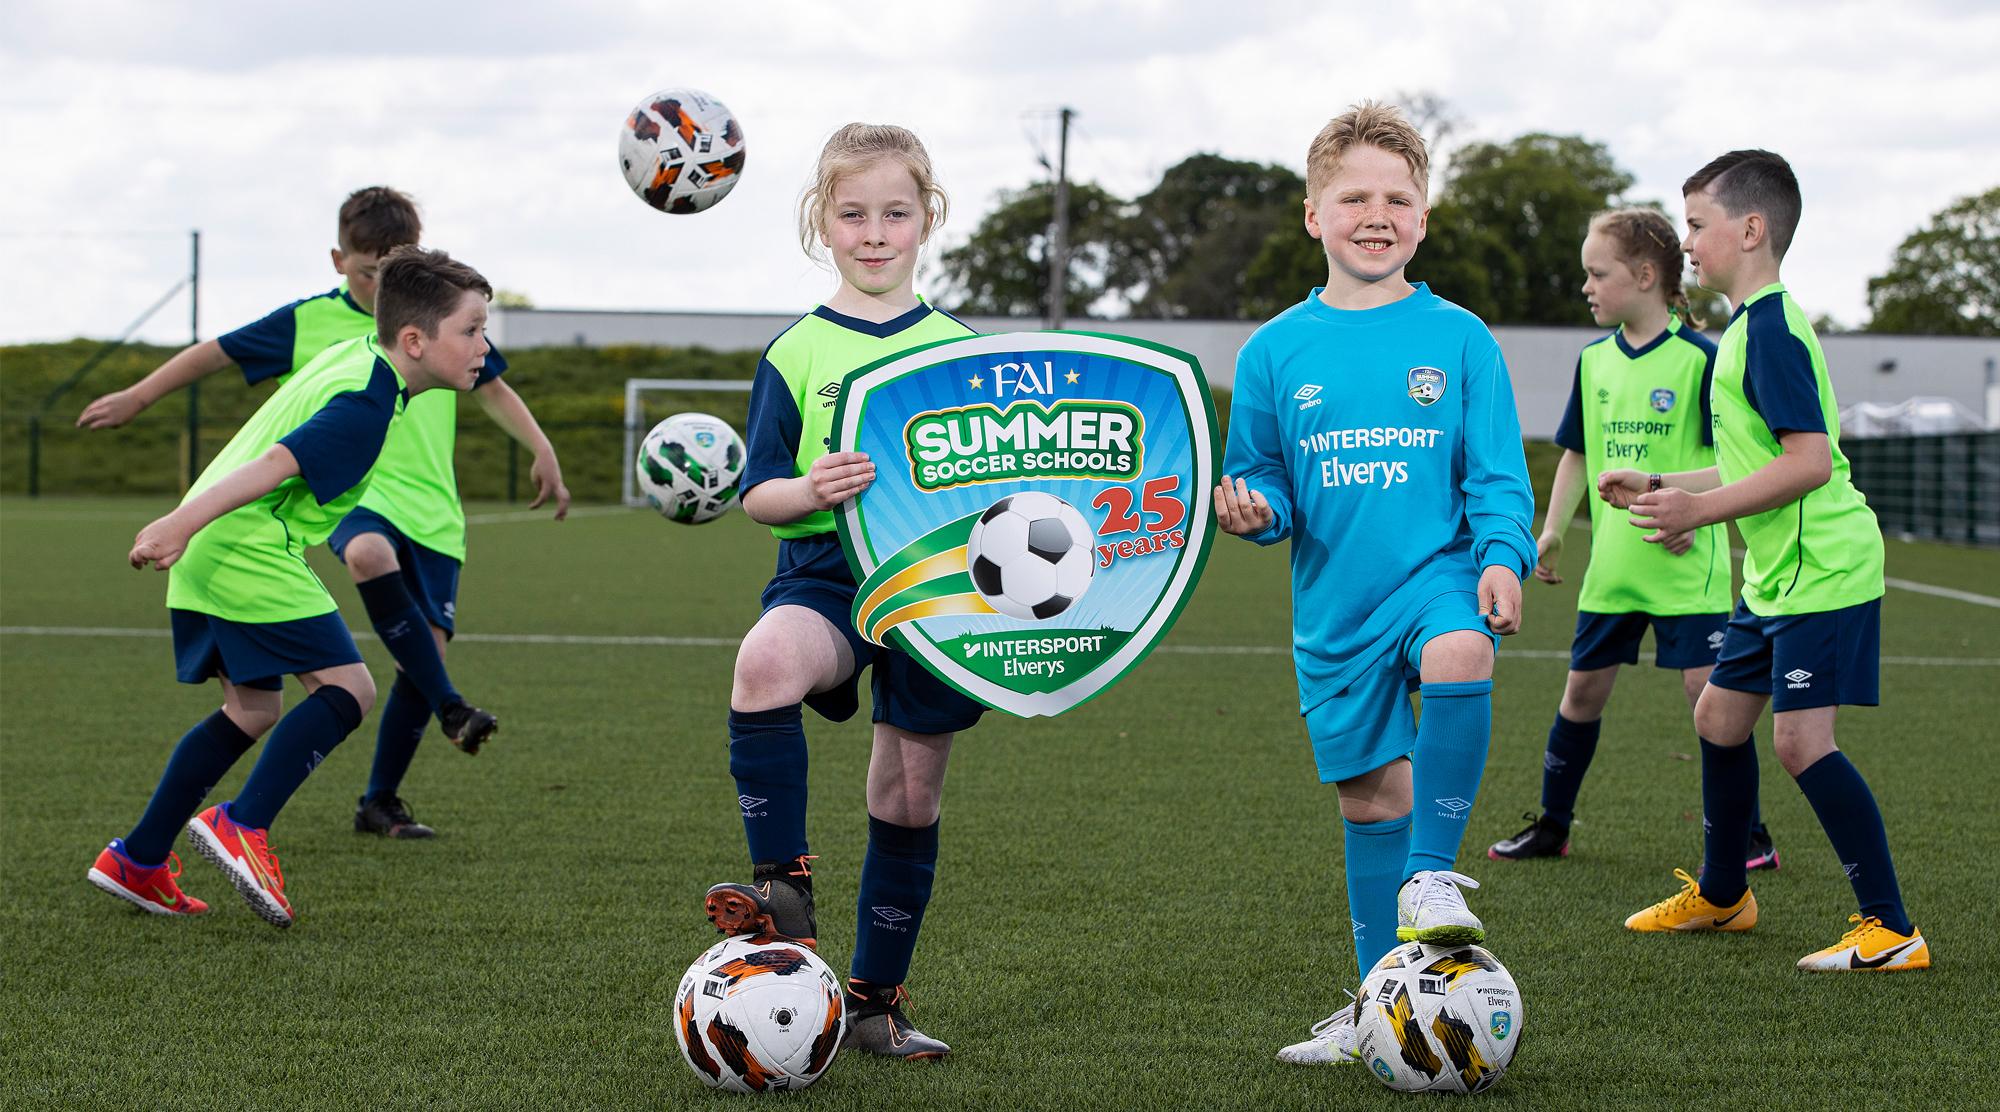 Intersport Elverys -Summer Soccer Schools